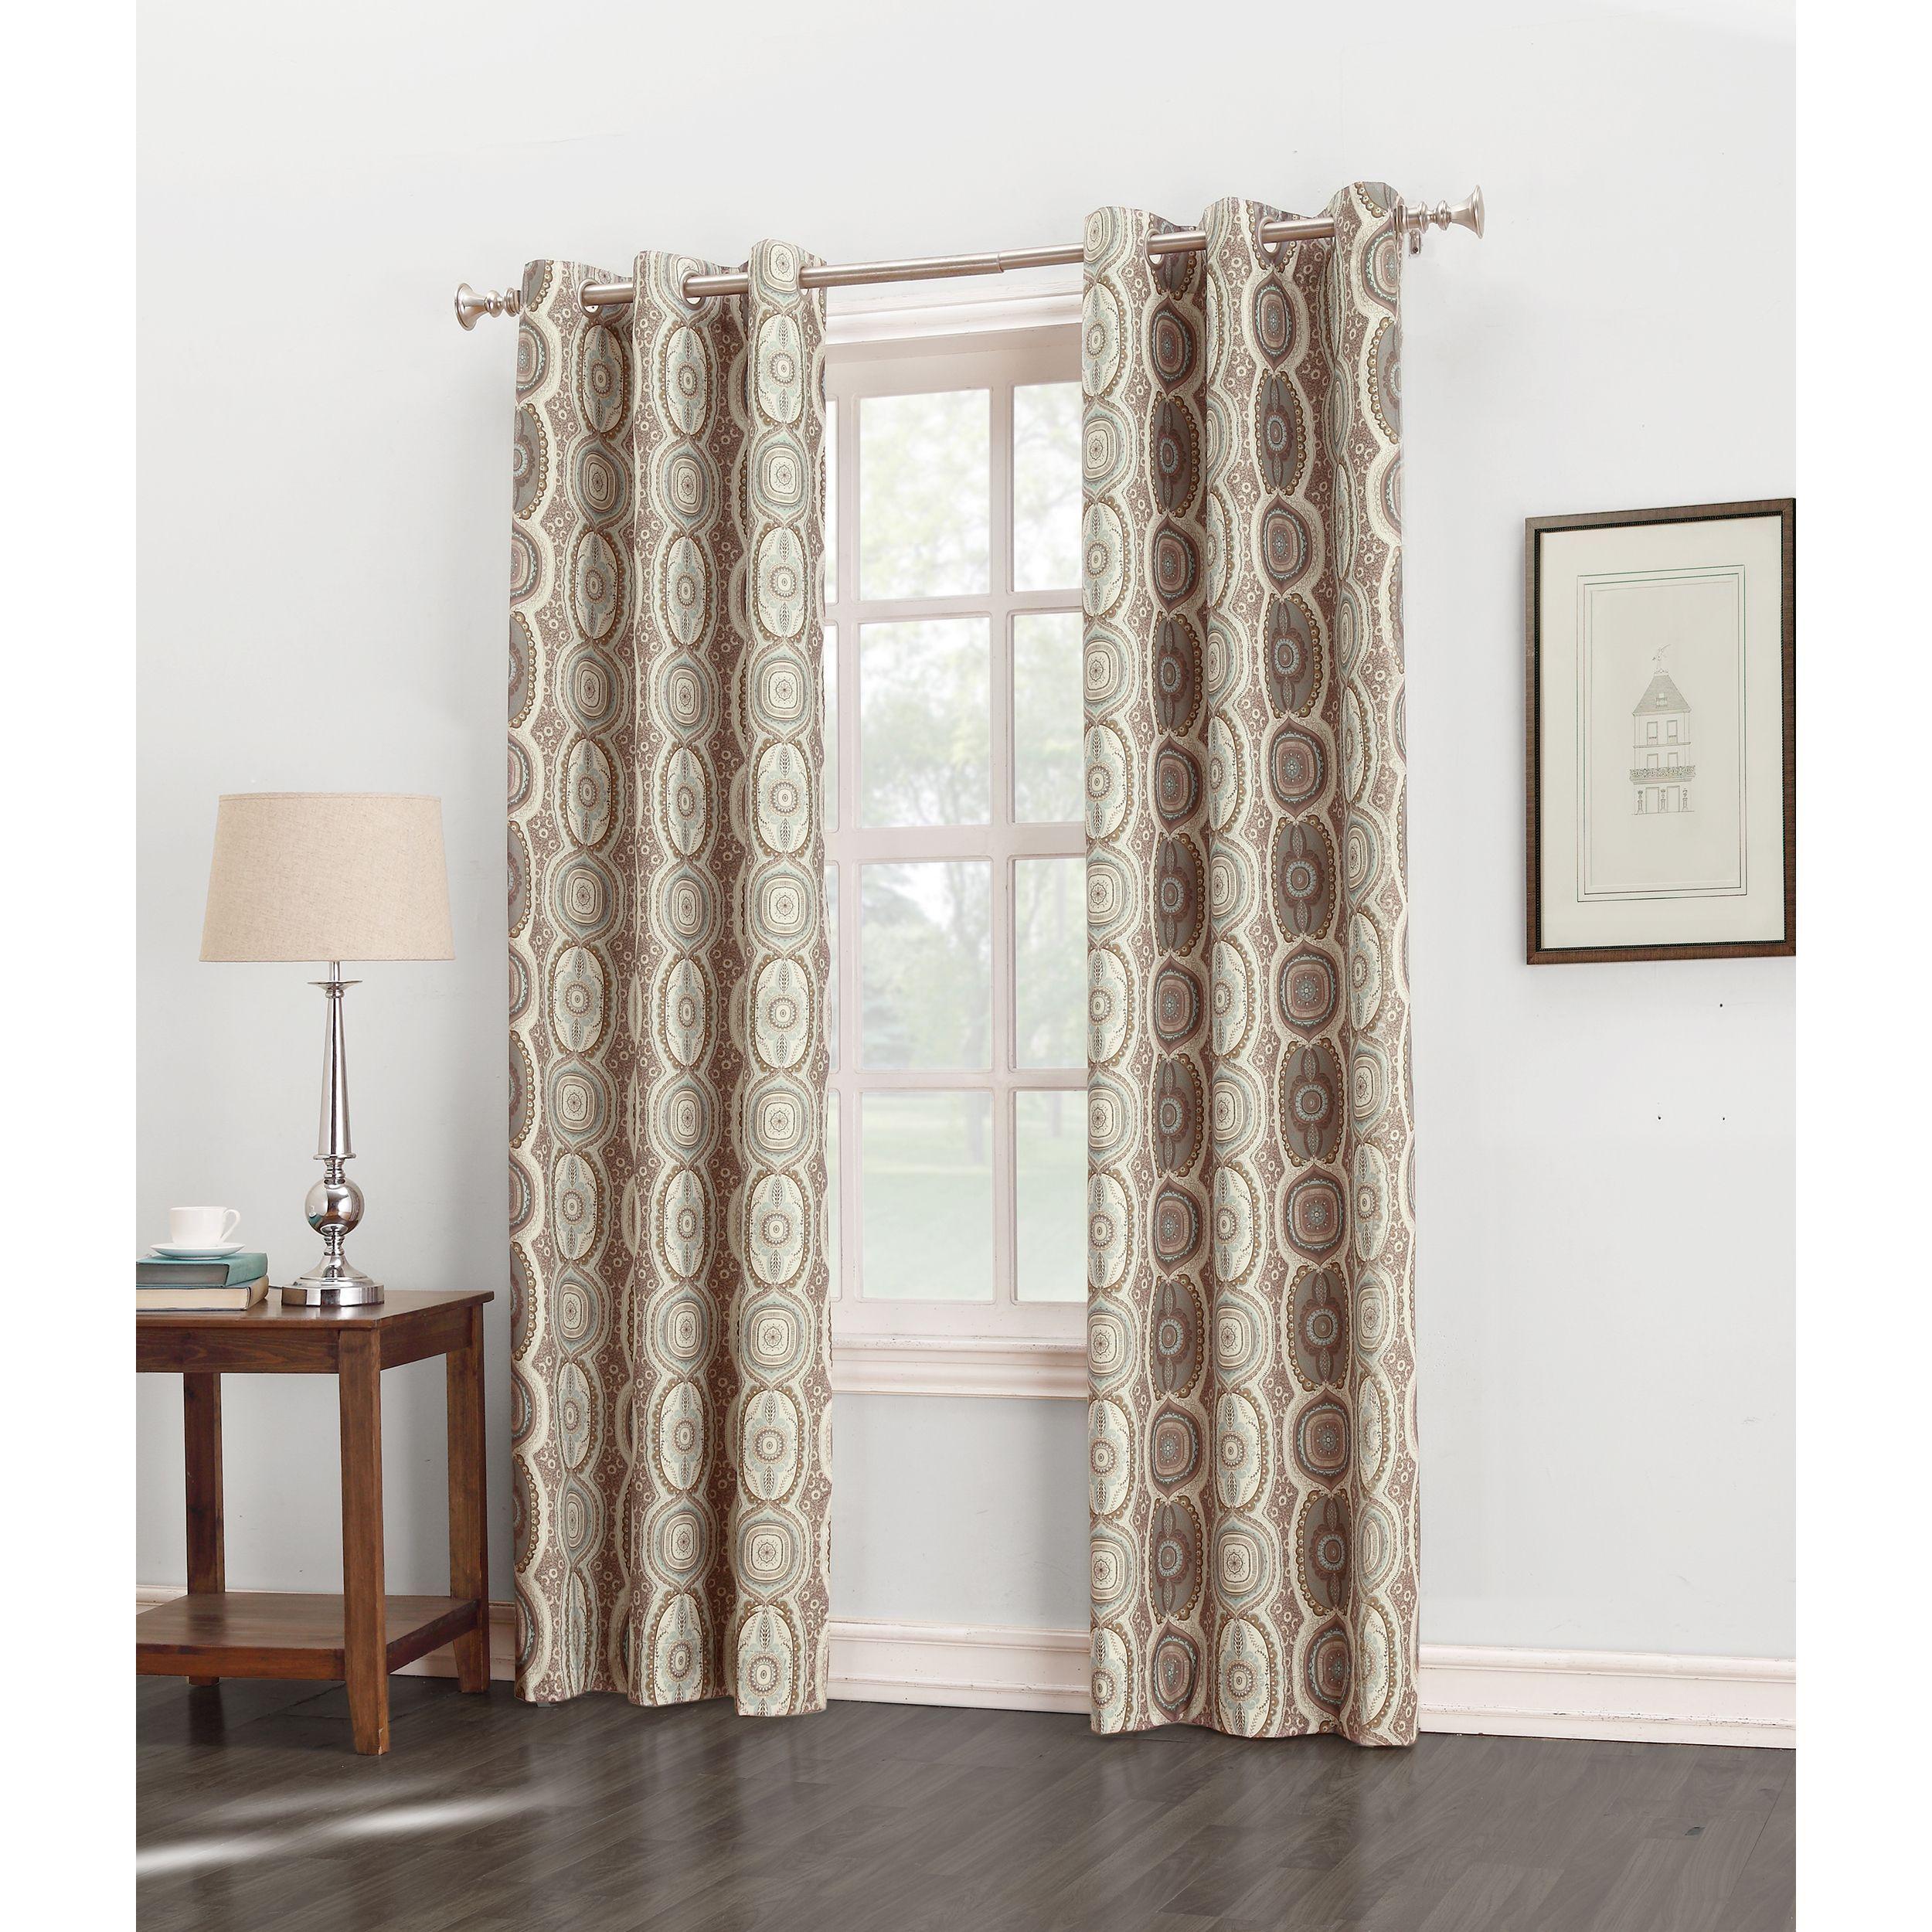 Sun zero carlene grommet thermal lined window curtain panel linen